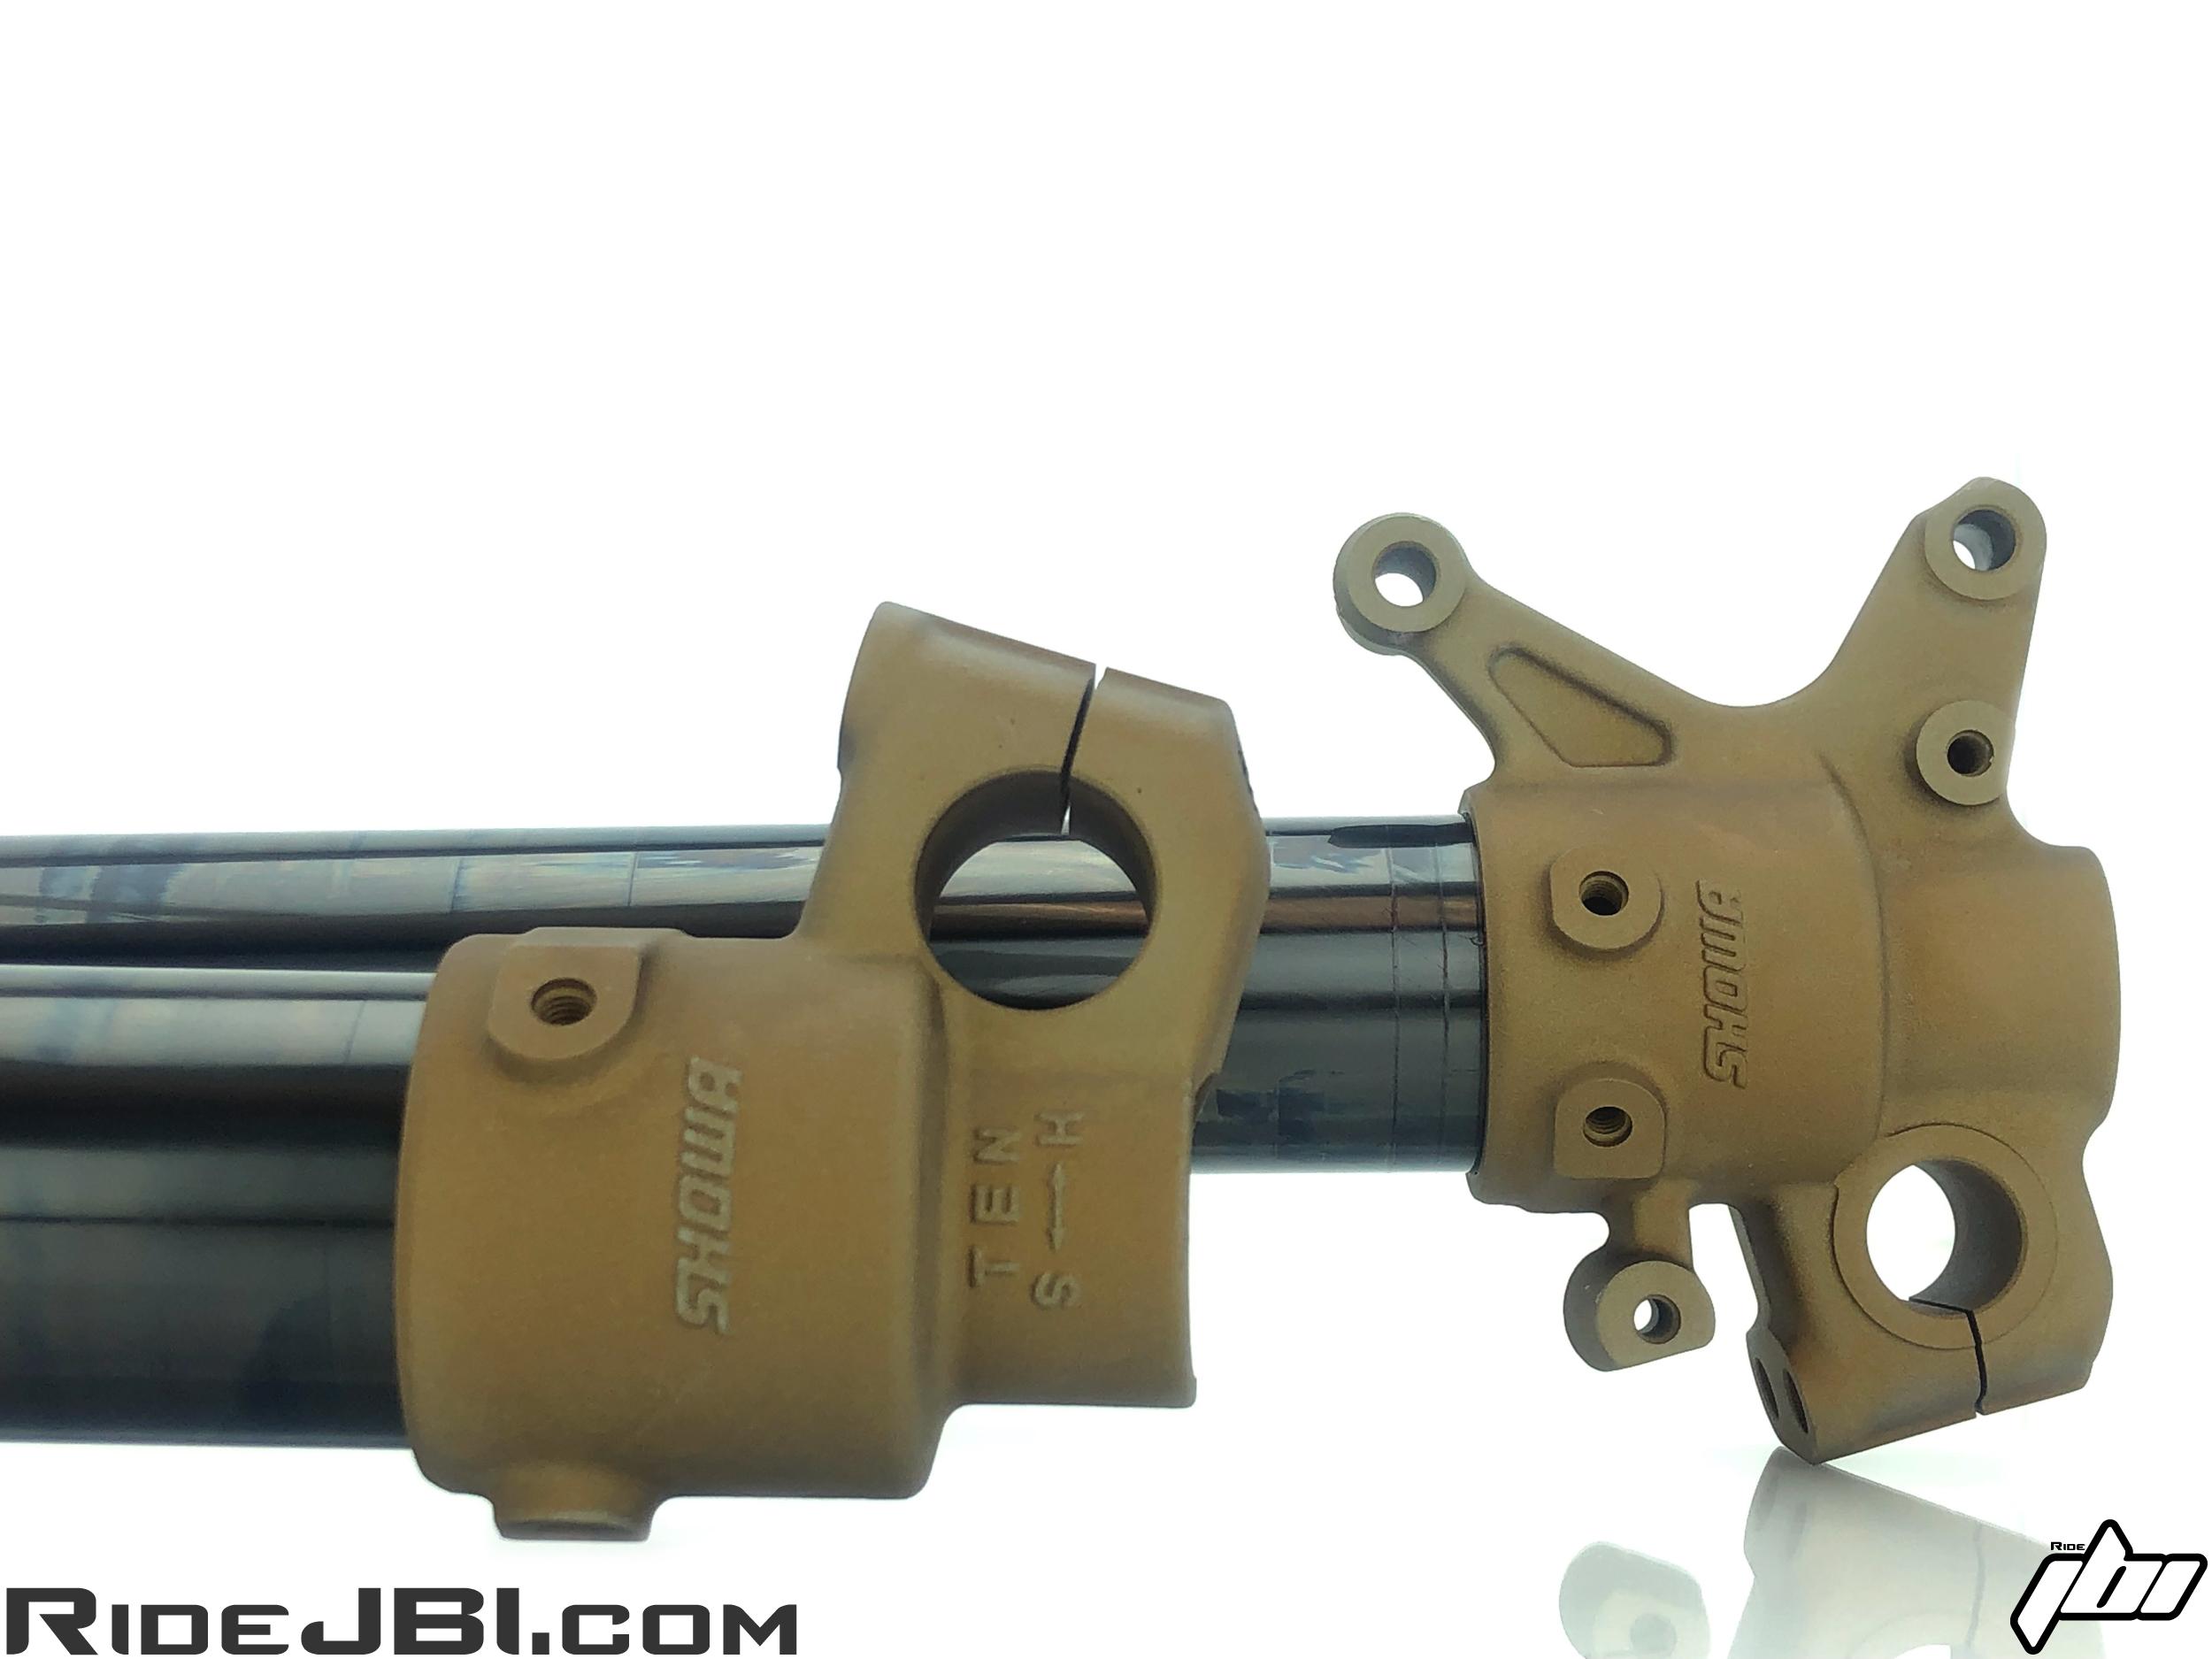 JBI Suspension hard anodize gold fork lugs